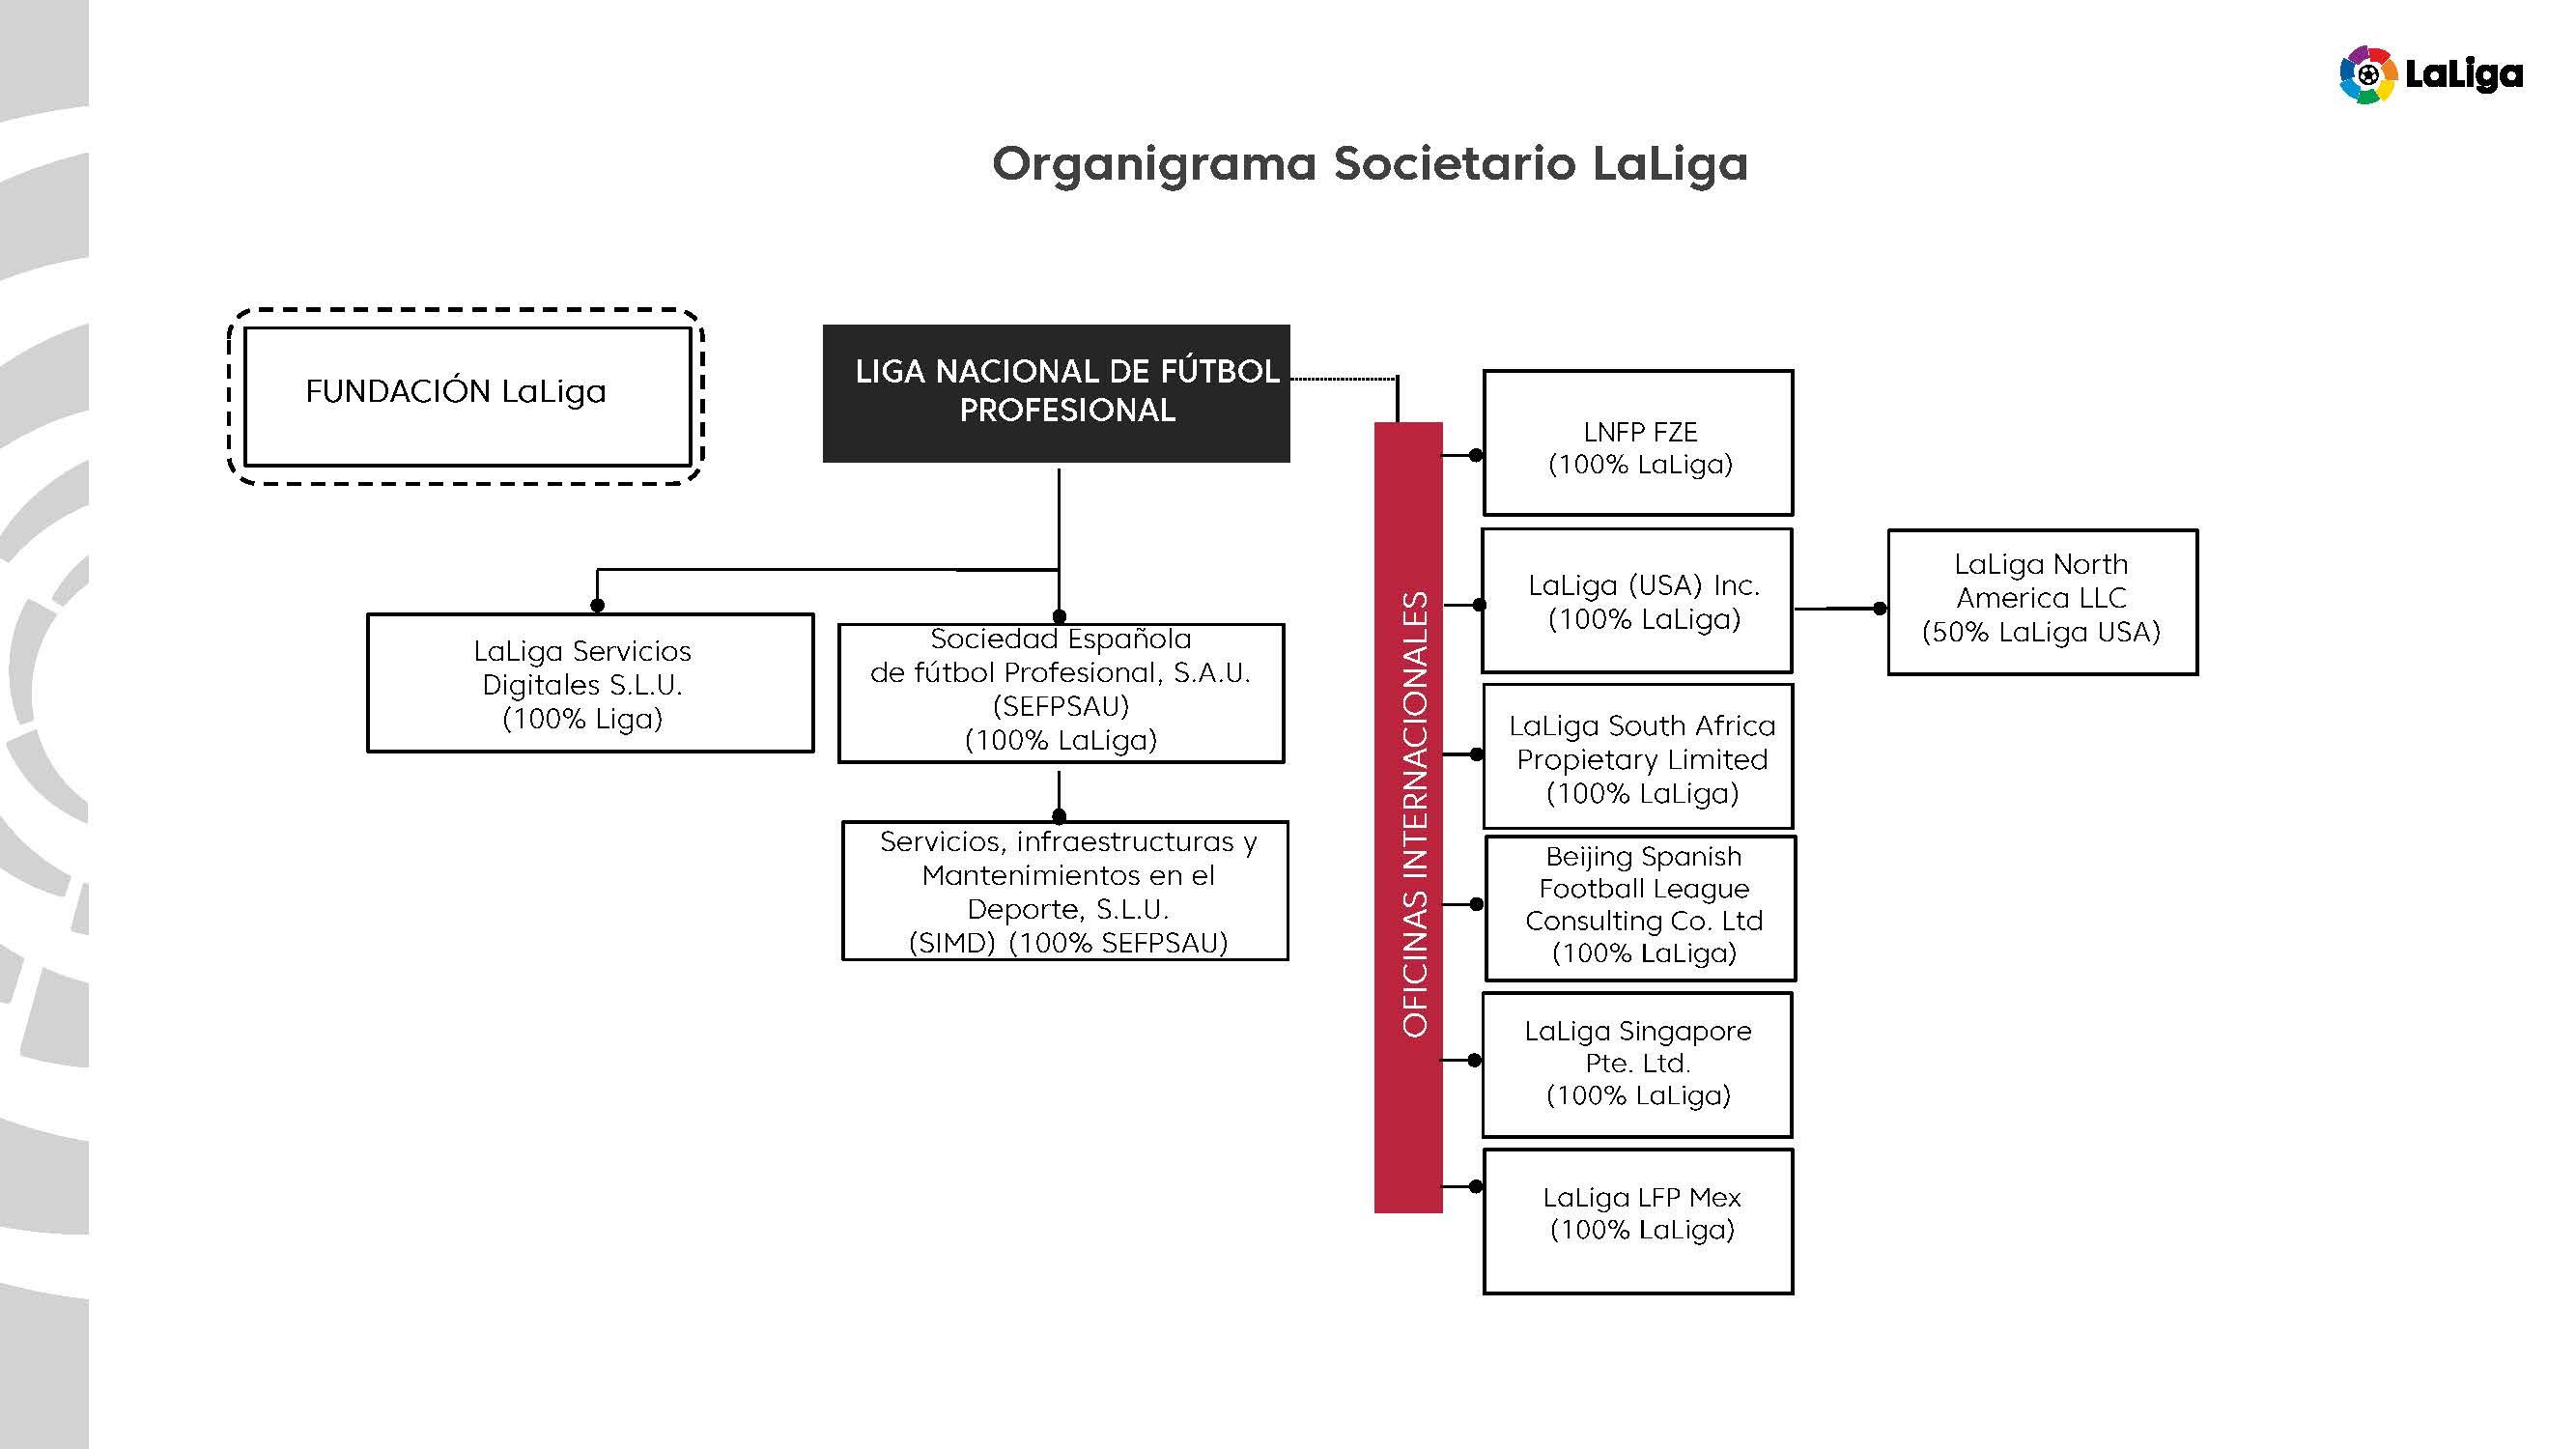 Organigrama societario